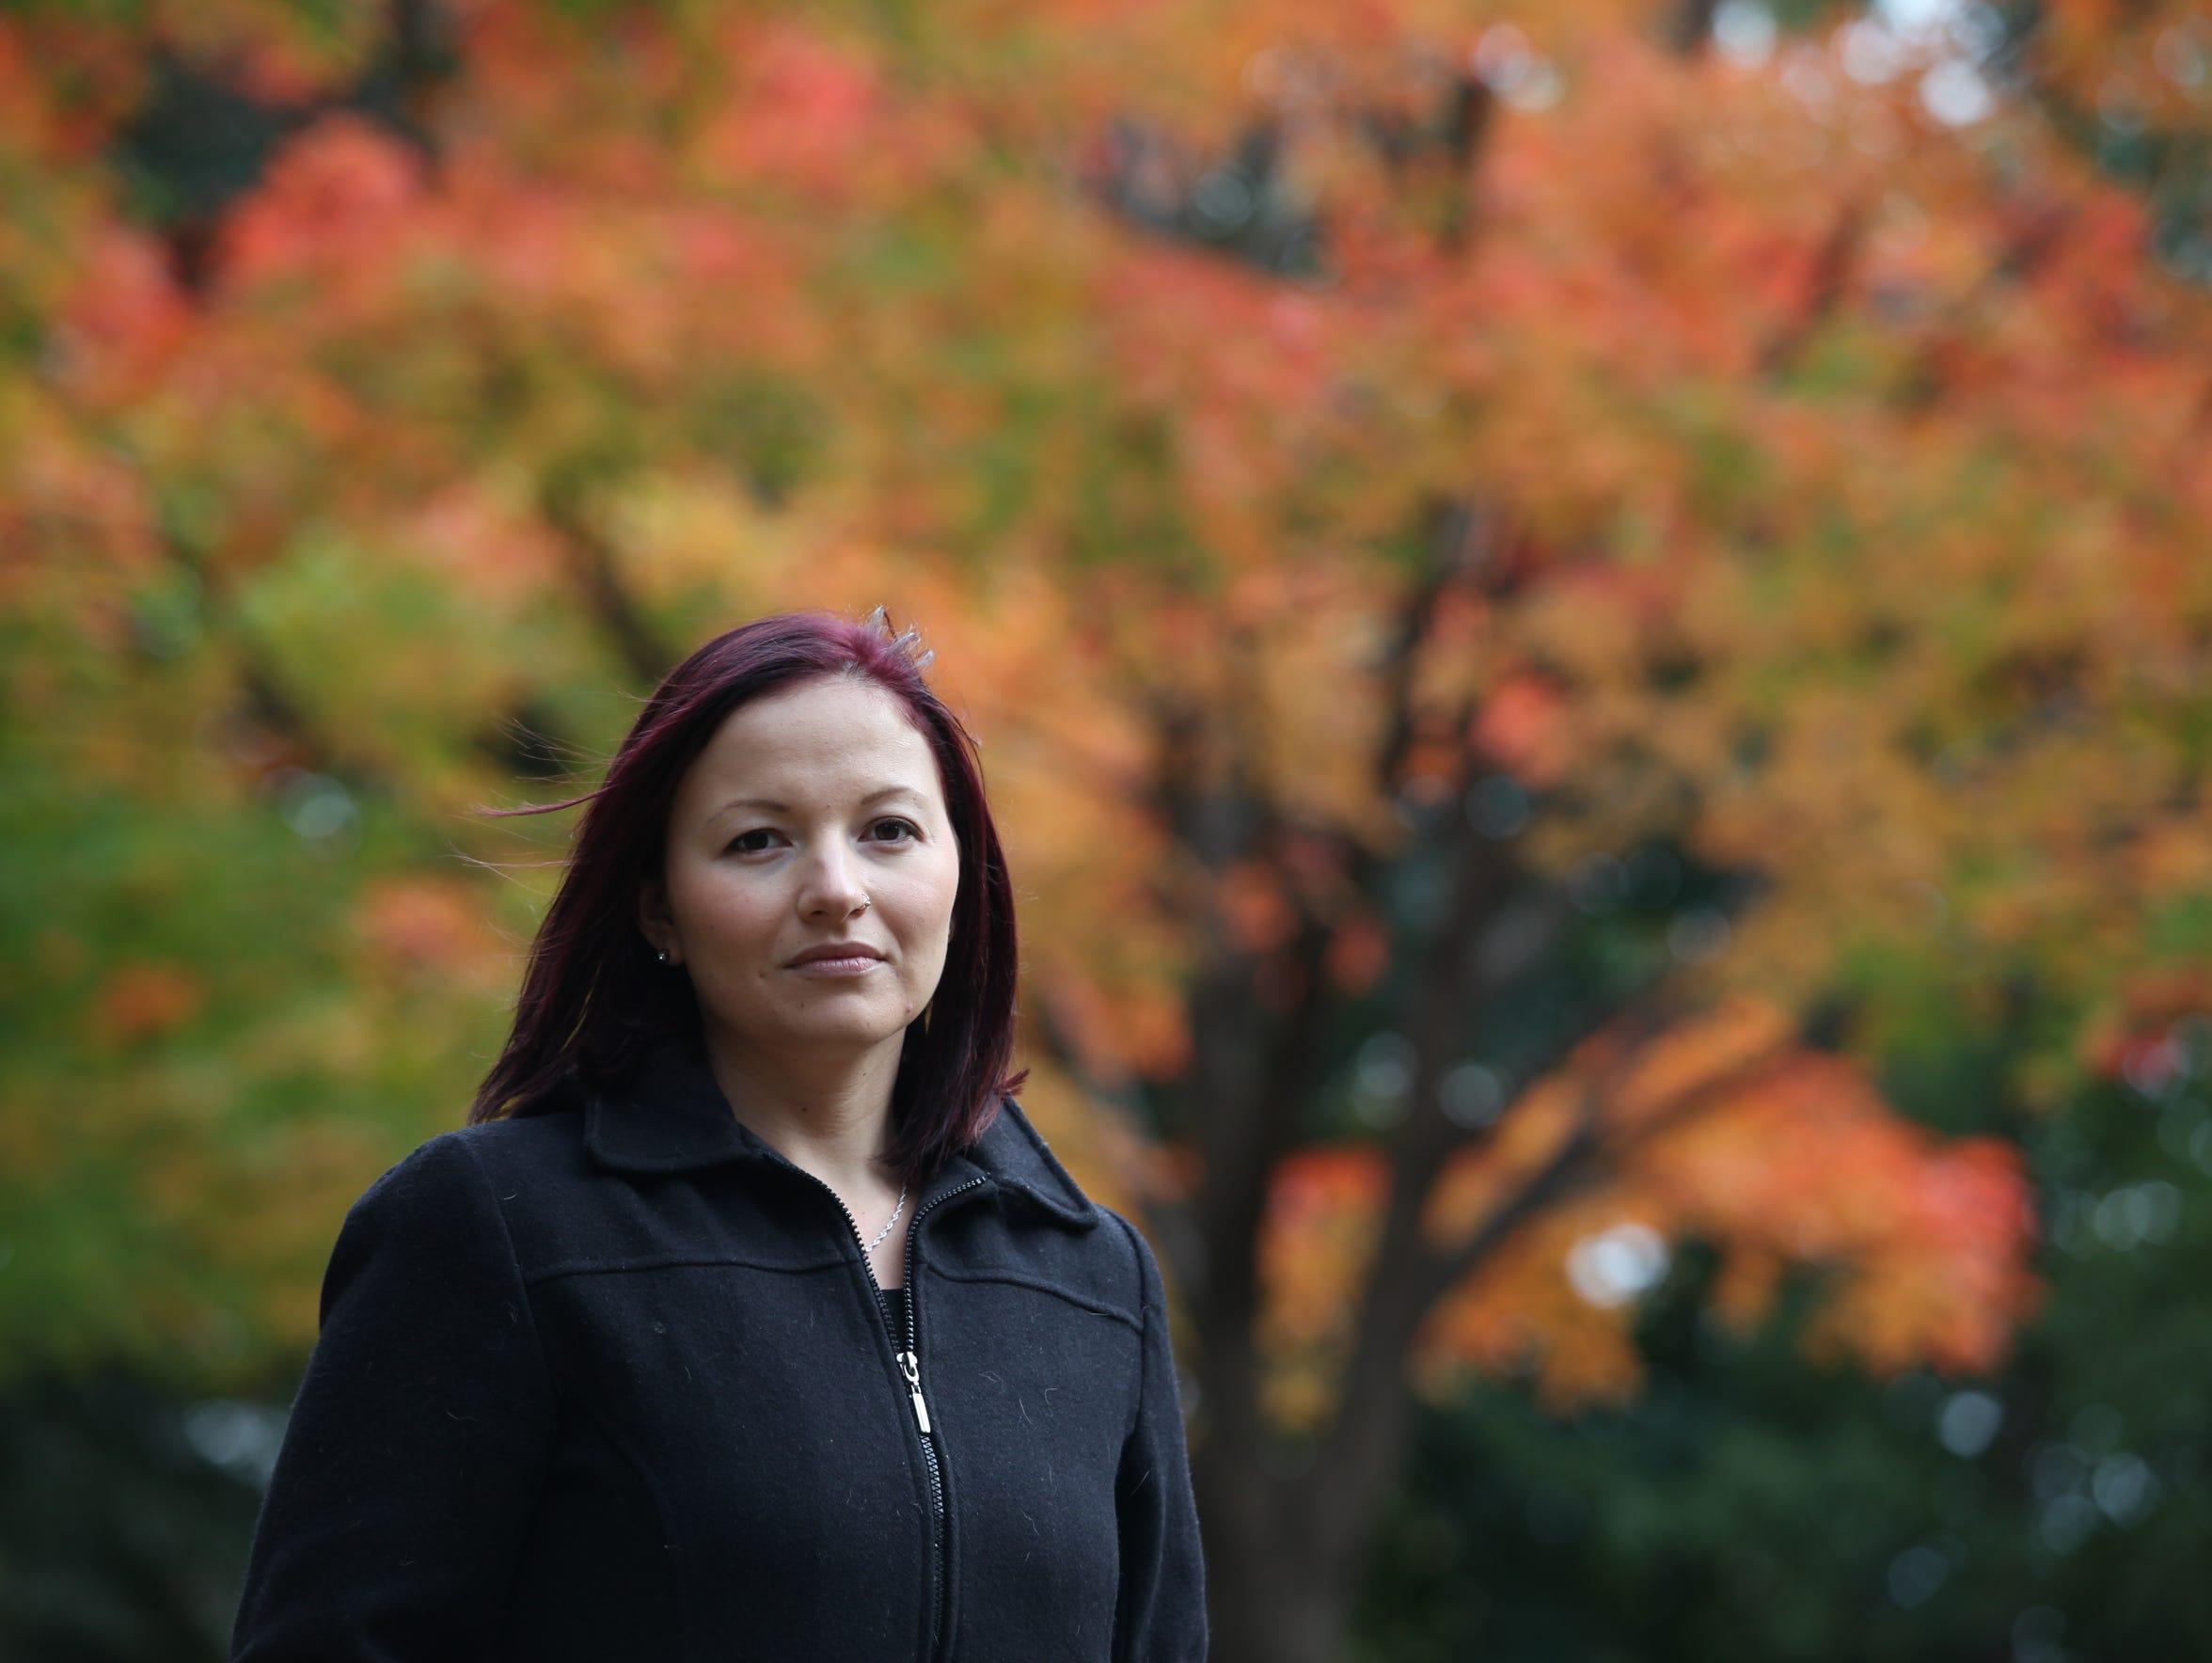 Tiffany Martinez credits the Portland Identification